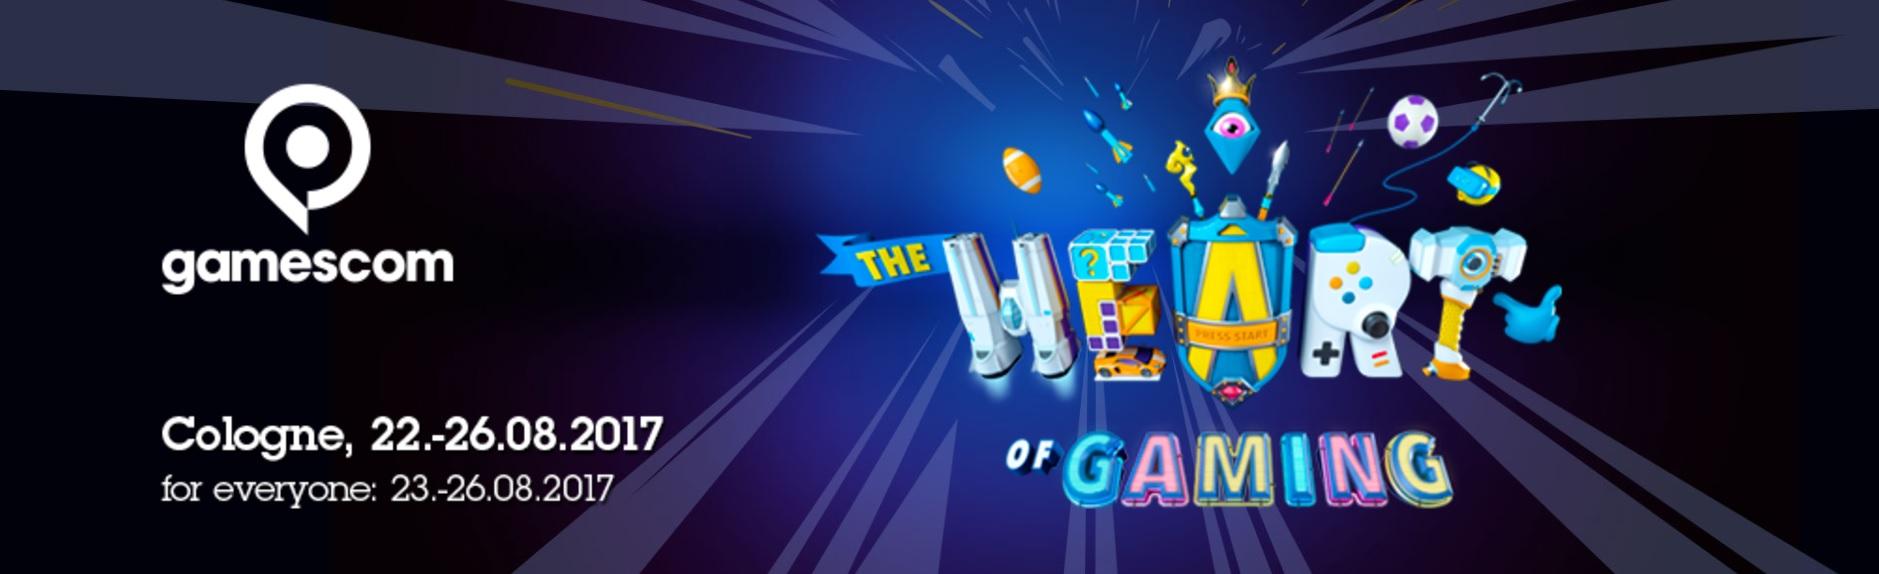 Gamescom Title